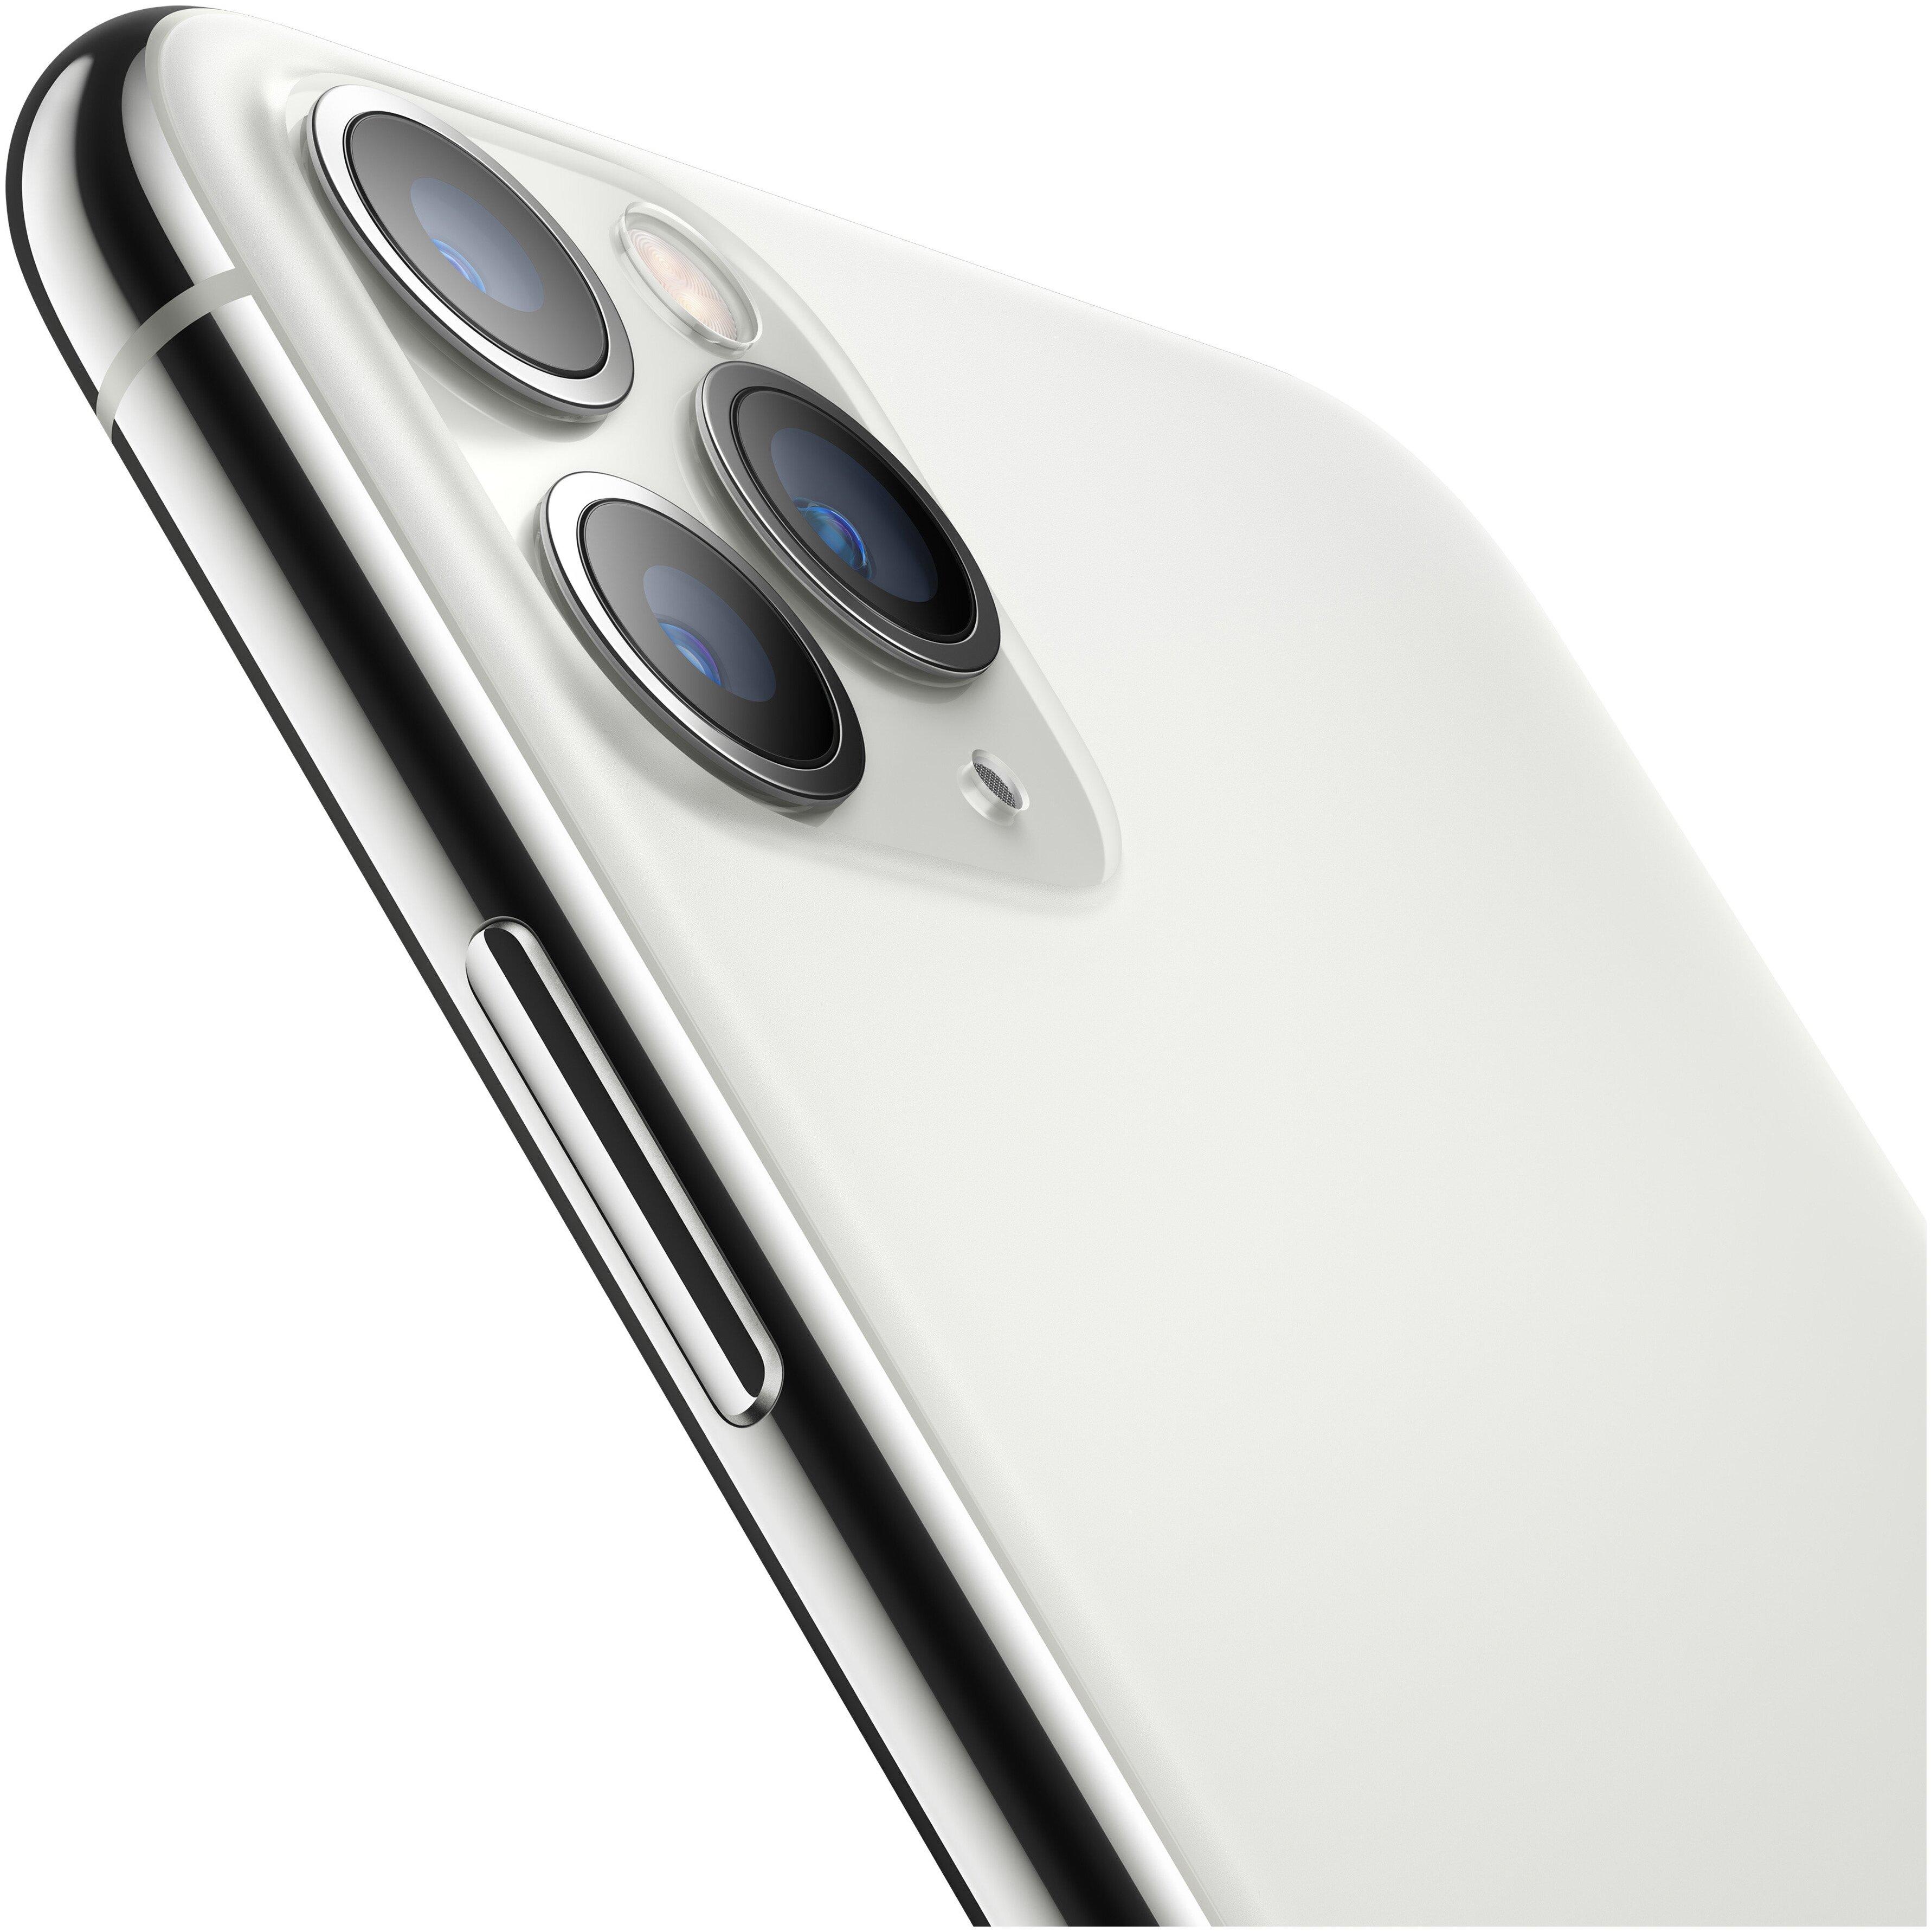 Apple iPhone 11 Pro 512GB - степень защиты: IP68